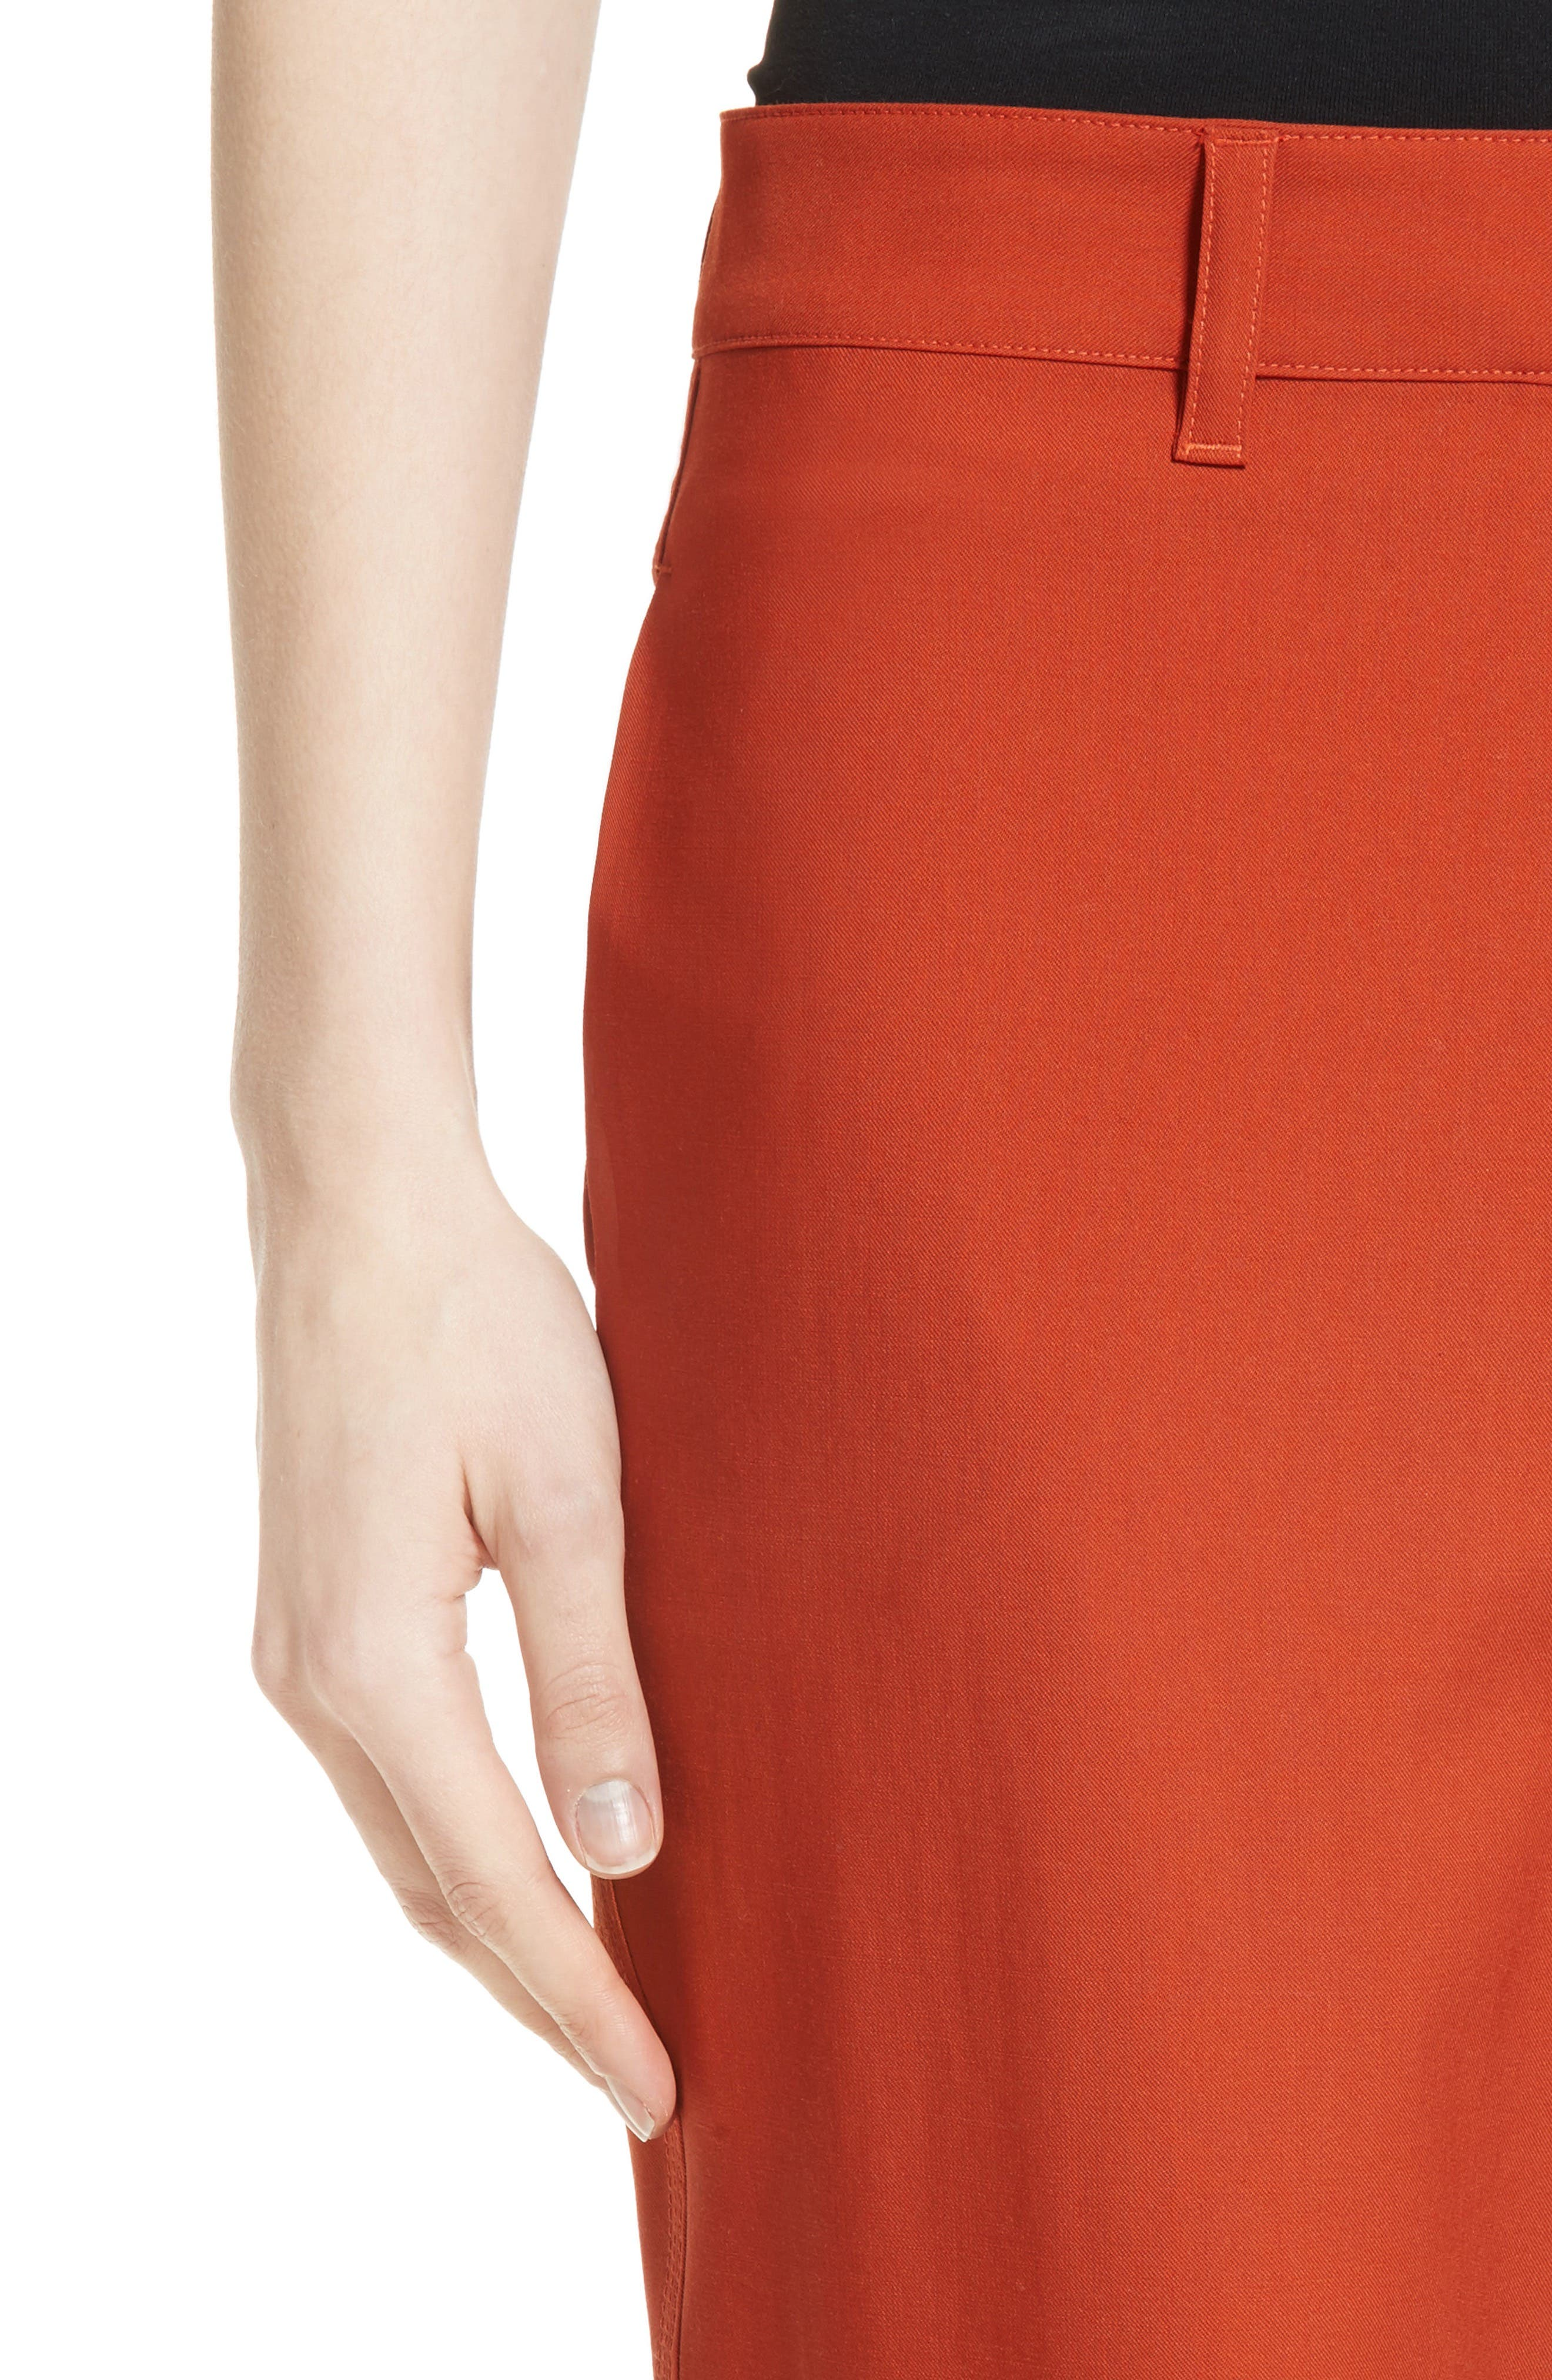 Thorelle B New Stretch Wool Pants,                             Alternate thumbnail 4, color,                             837